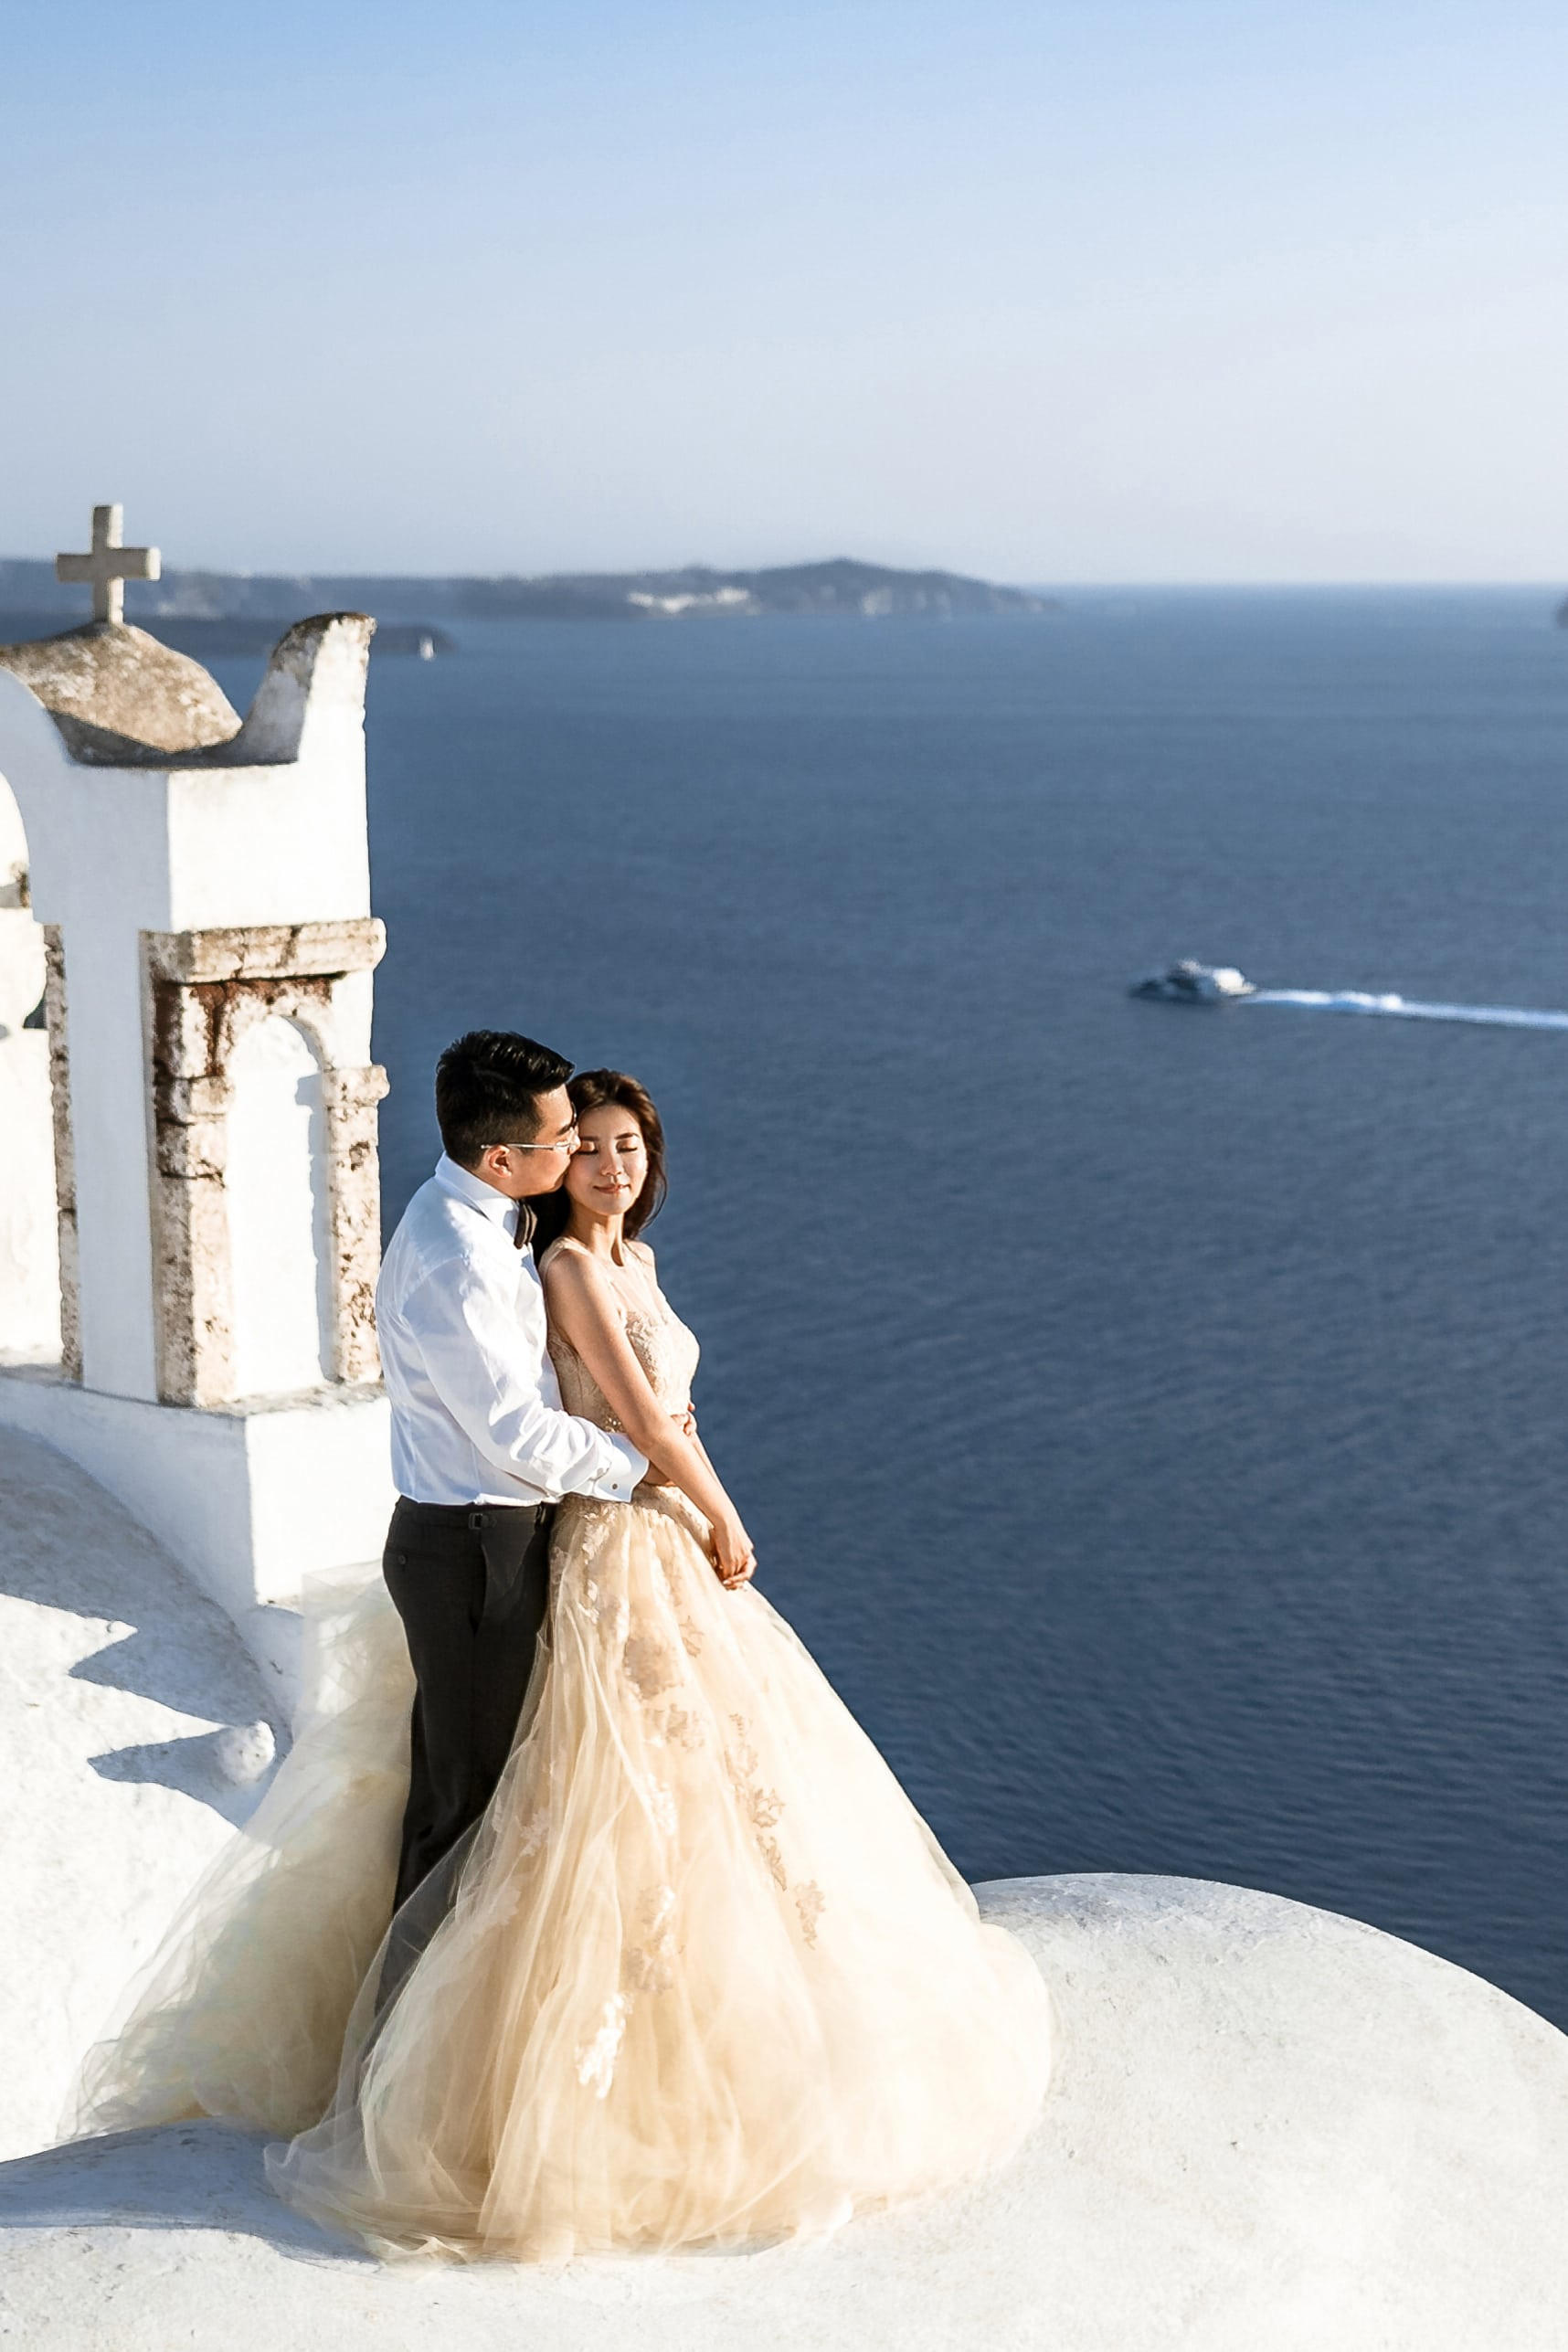 Next day Γάμου - Φωτογράφιση στη Σαντορίνη